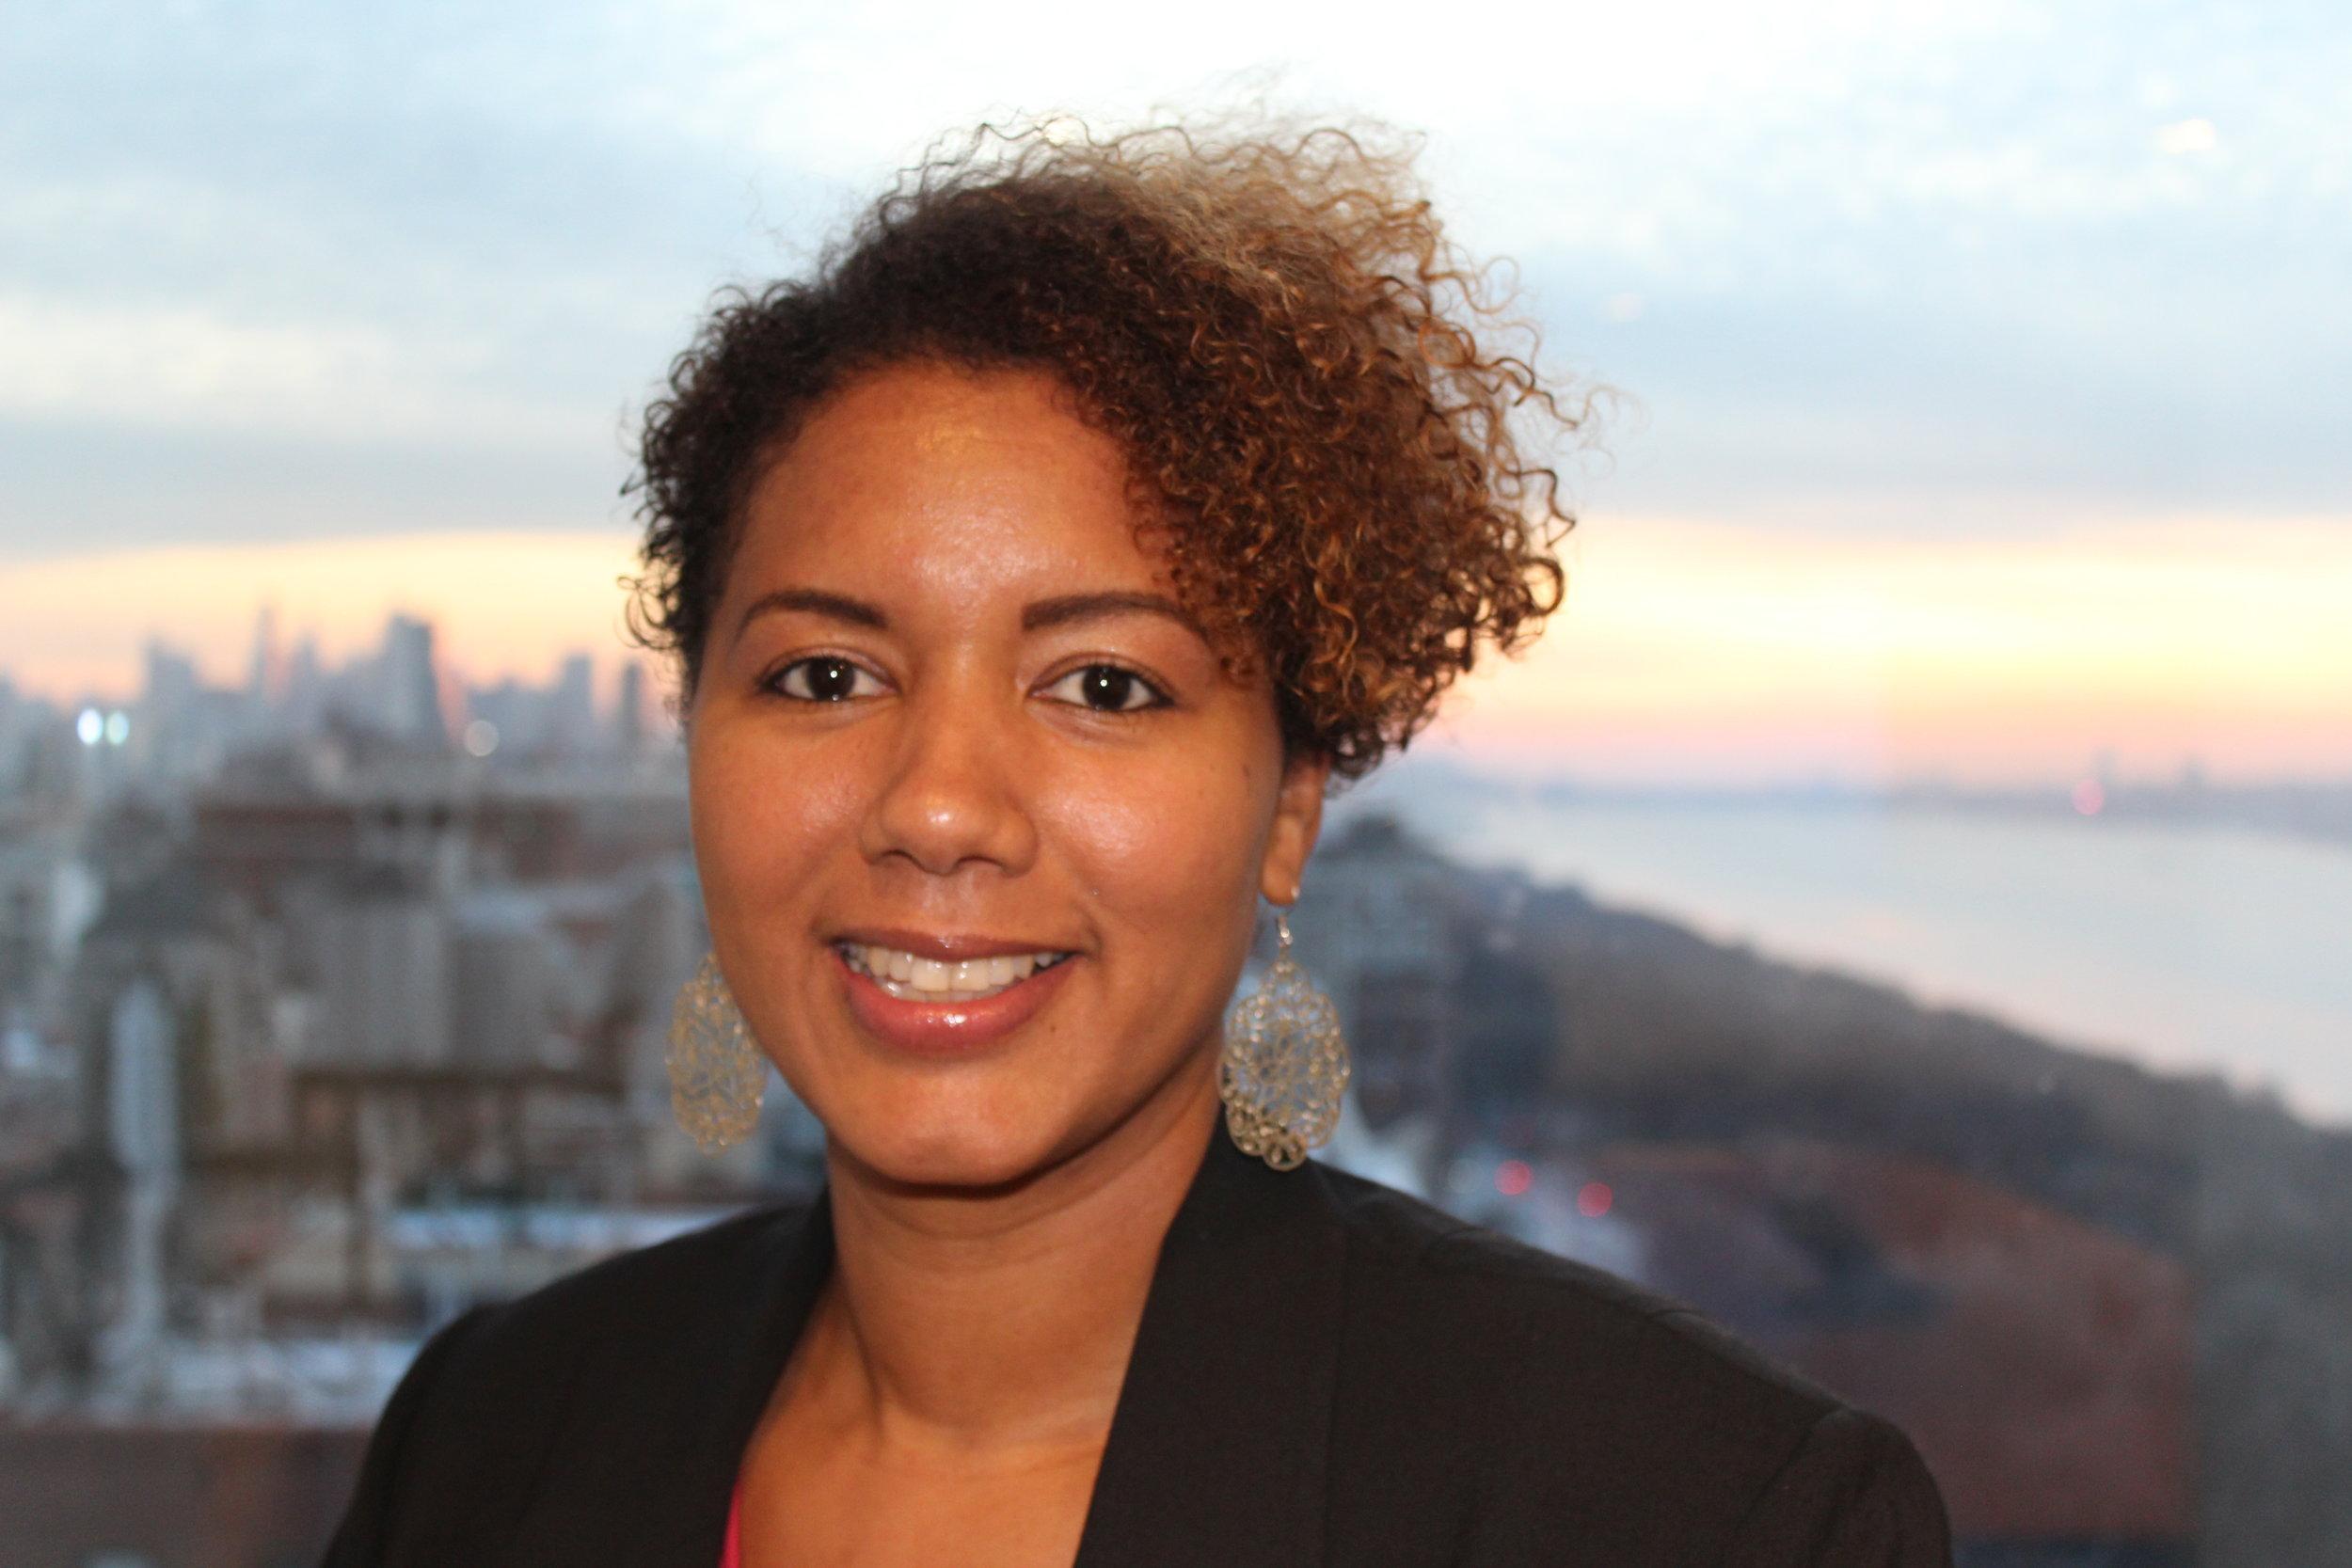 Takiema Bunche-Smith, Director of Early Childhood Programs